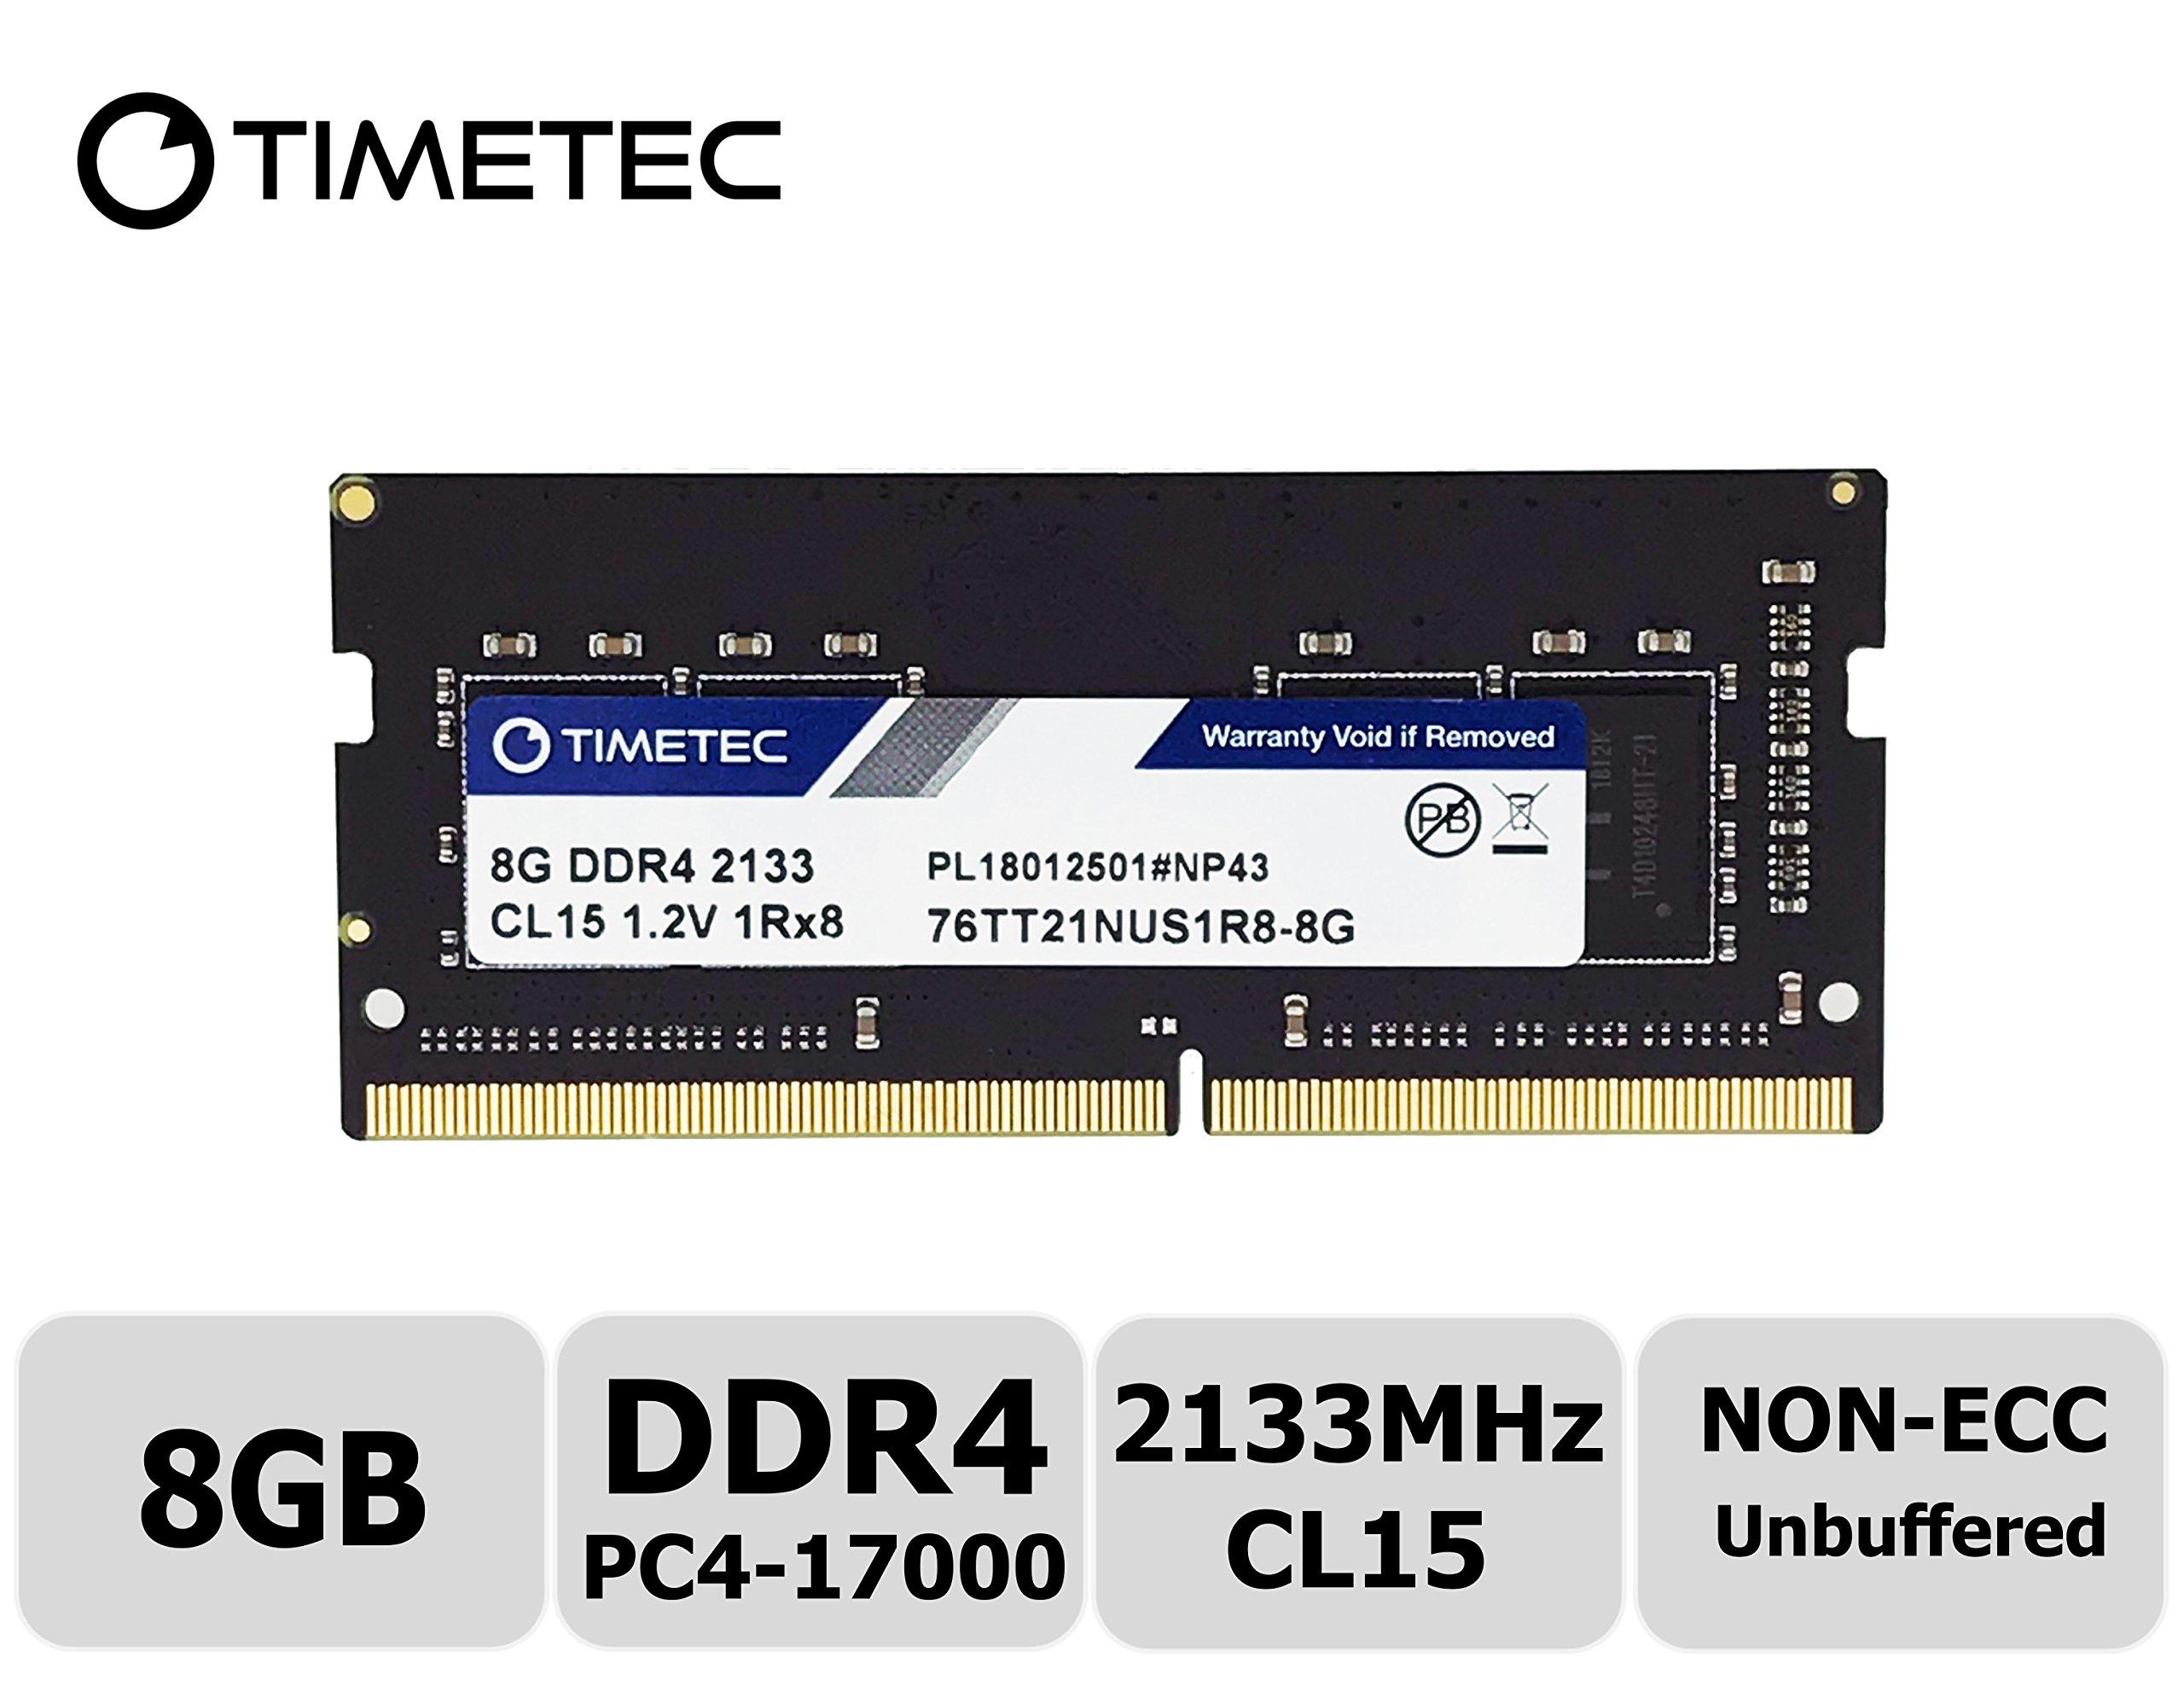 Memoria Ram 8gb Timetec Hynix Ic Ddr4 Sodimm Para Intel Nuc Kit/mini Pc/htpc/nuc Board 2133mhz Pc4-17000 Non Ecc Unbuffe